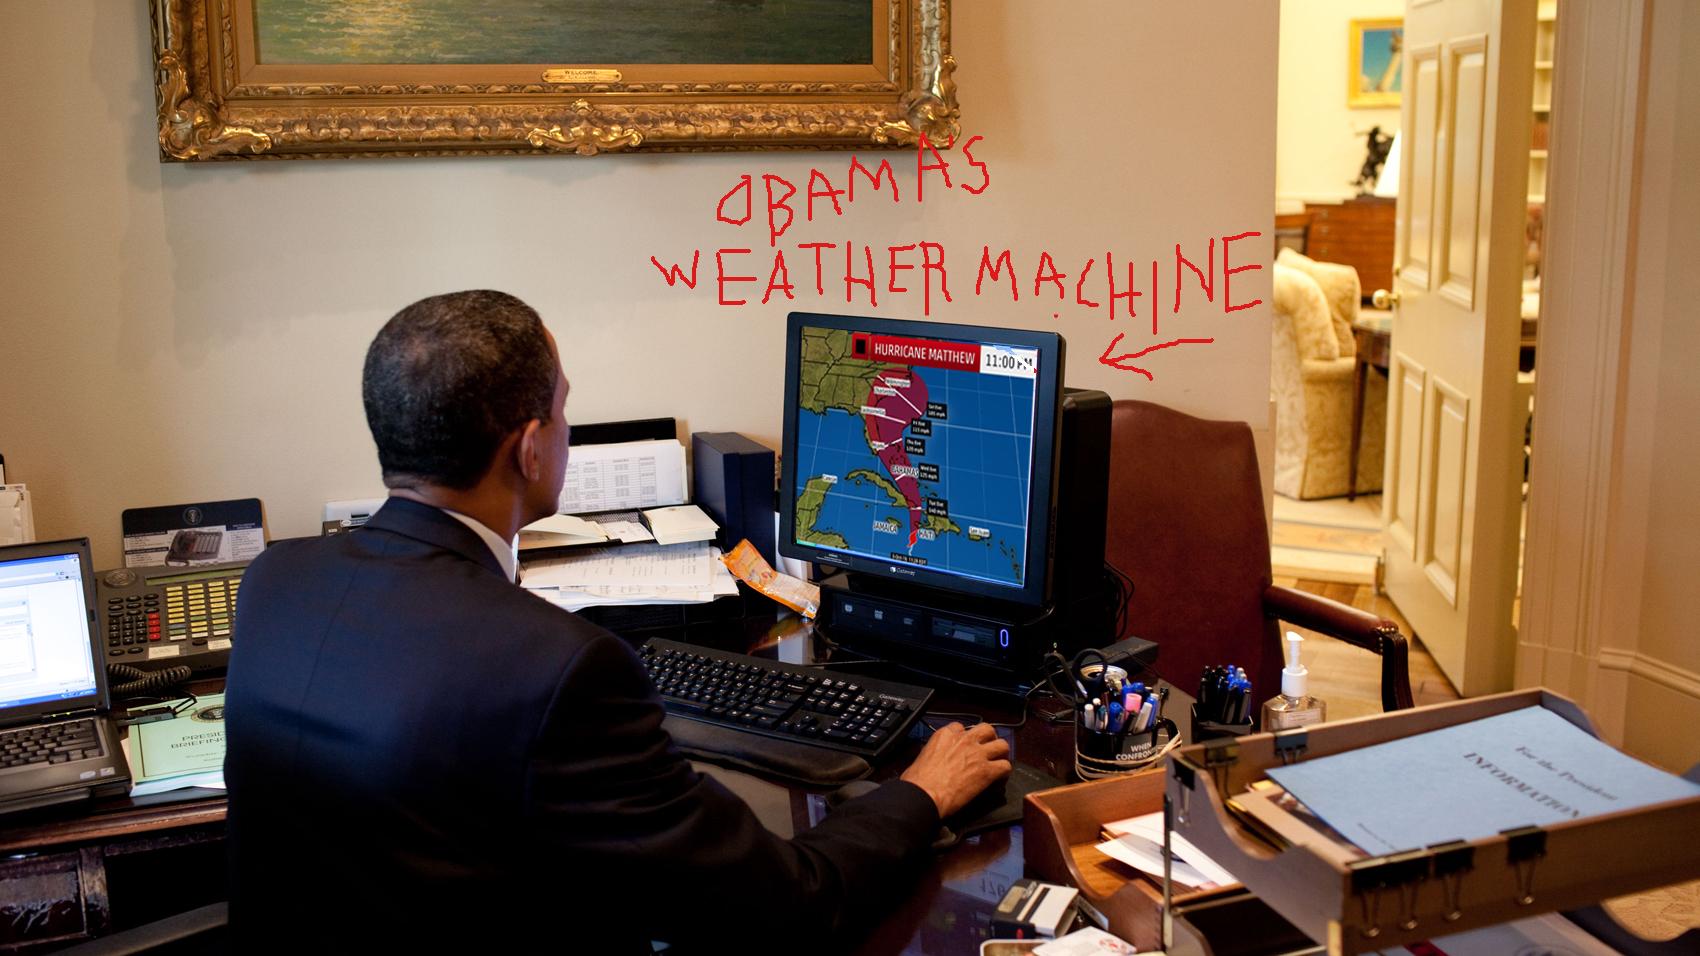 obama weather machine